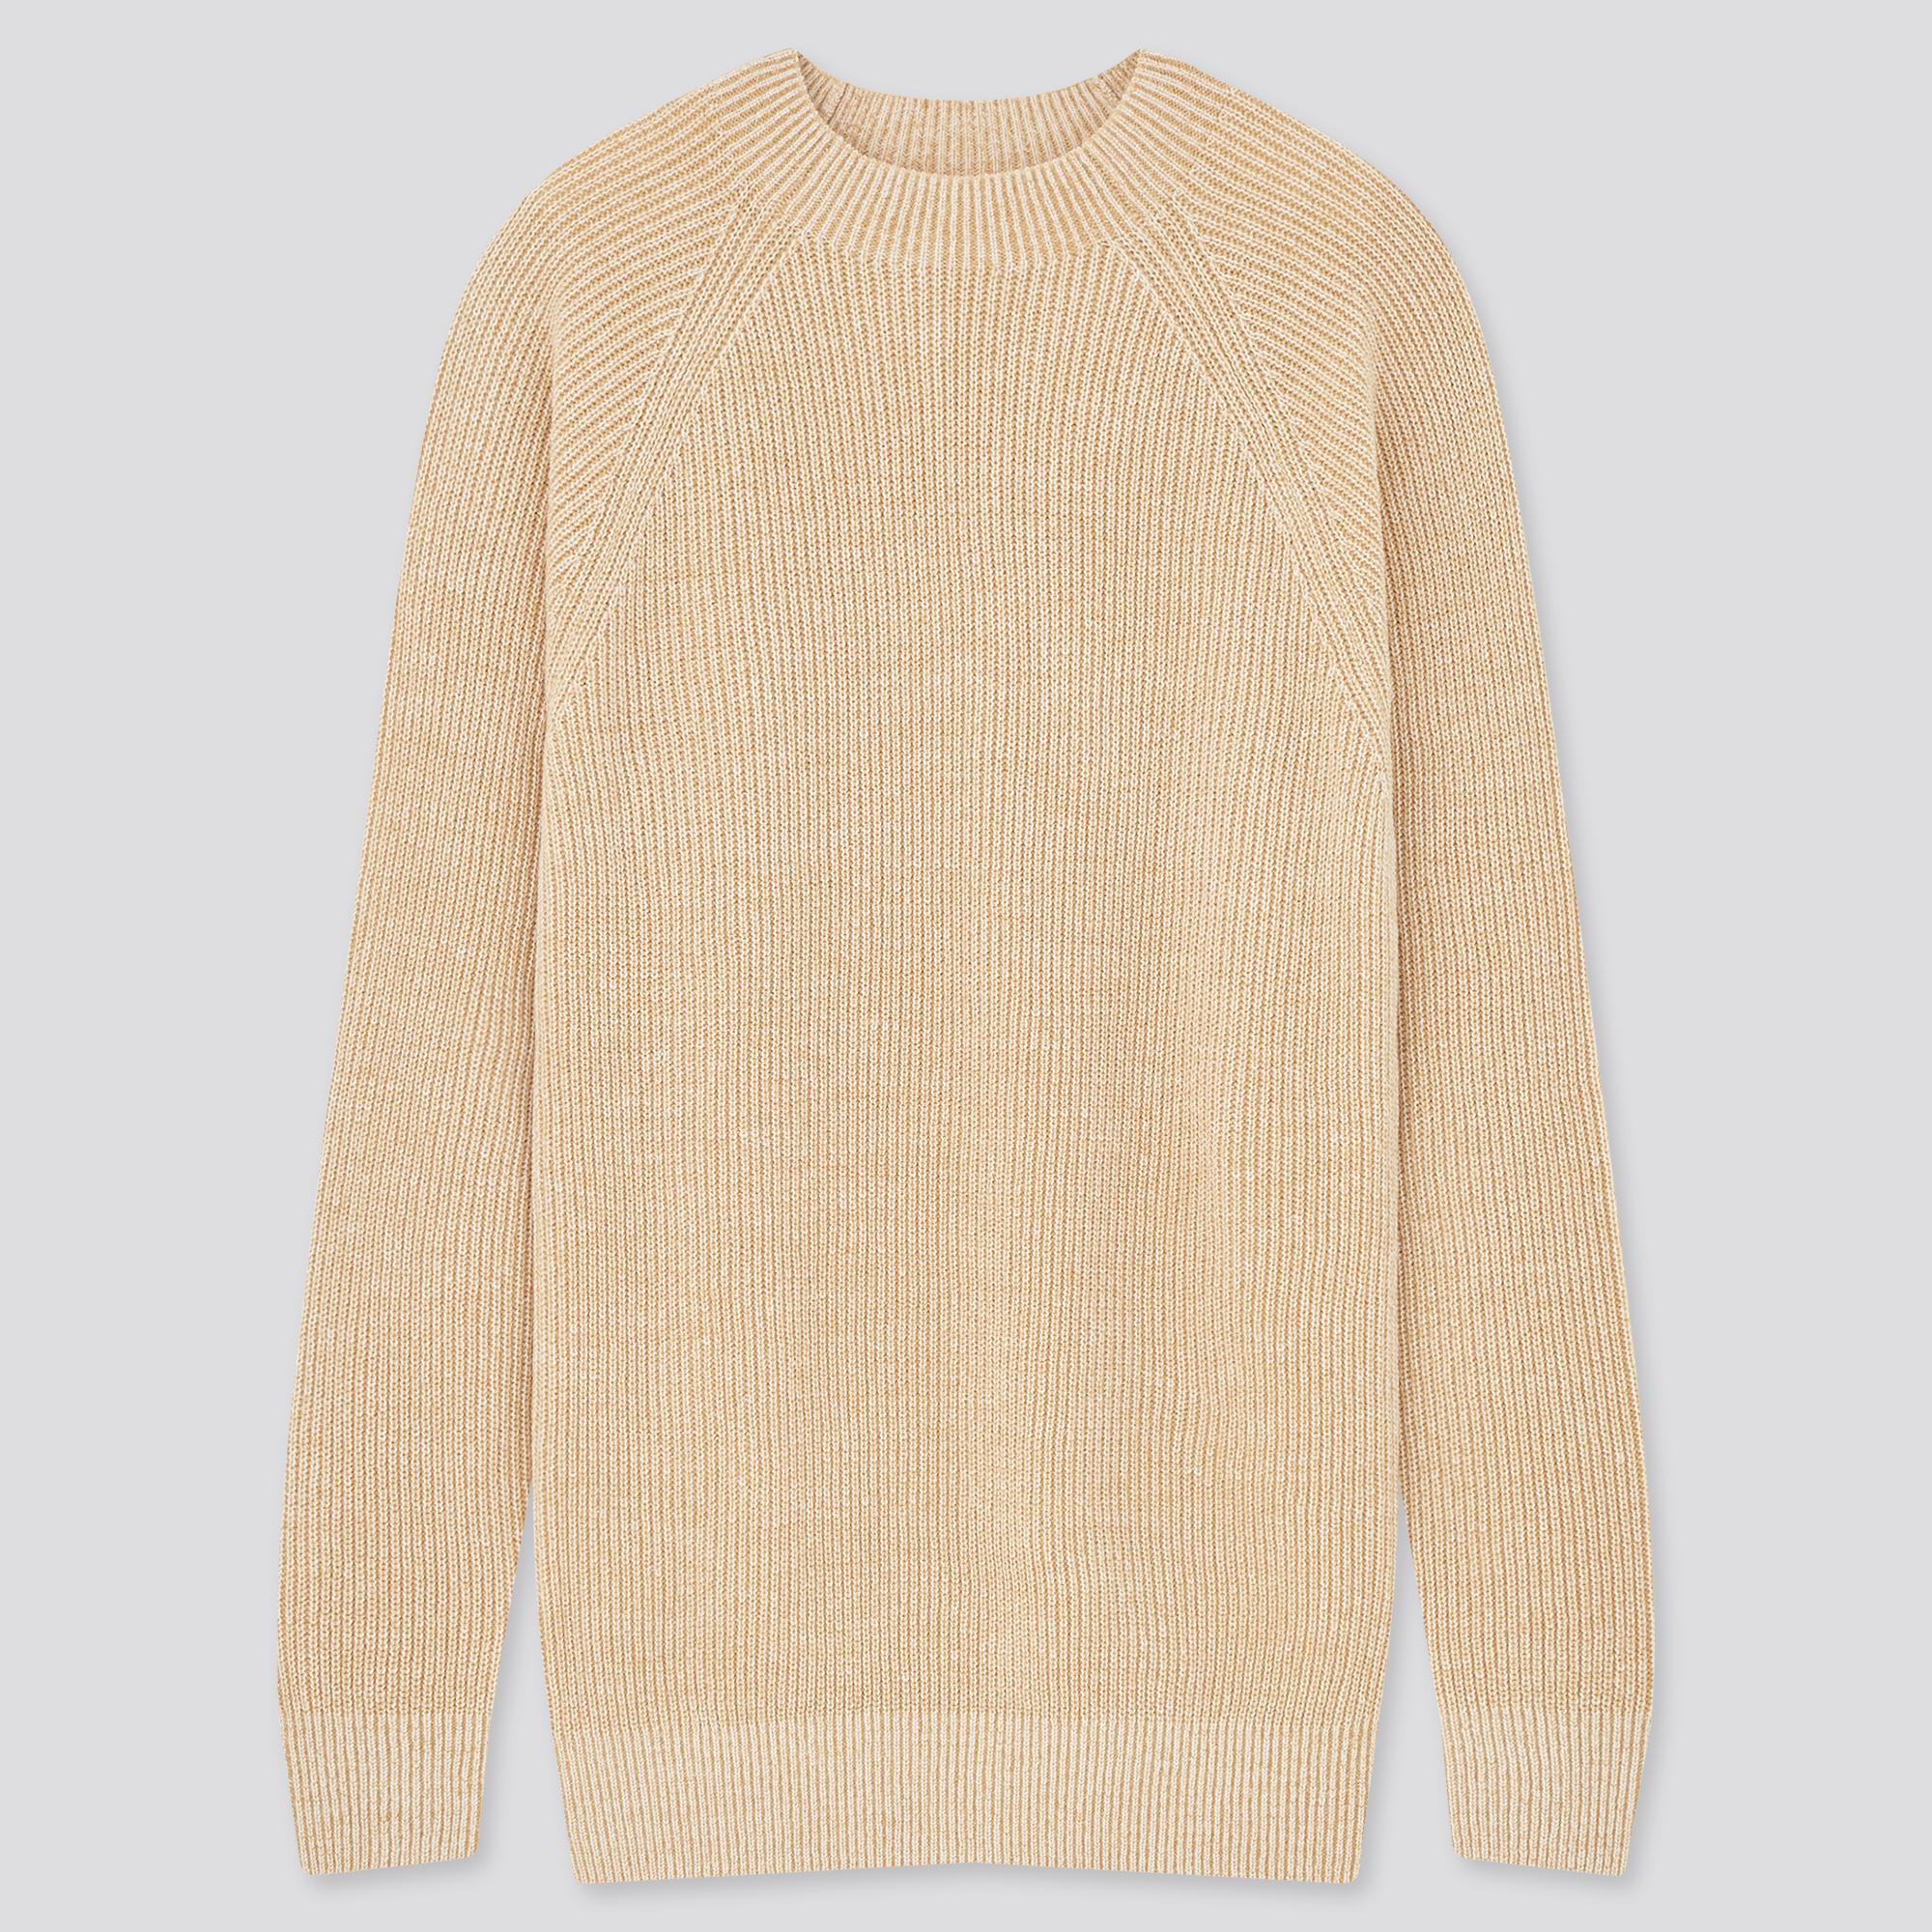 TUNDRA L Mens Sweater fits M to ML Mercerised Cotton Hip Hop Crew Neck Coogi Style Multicolor Earthtones Geometric Coogi Like